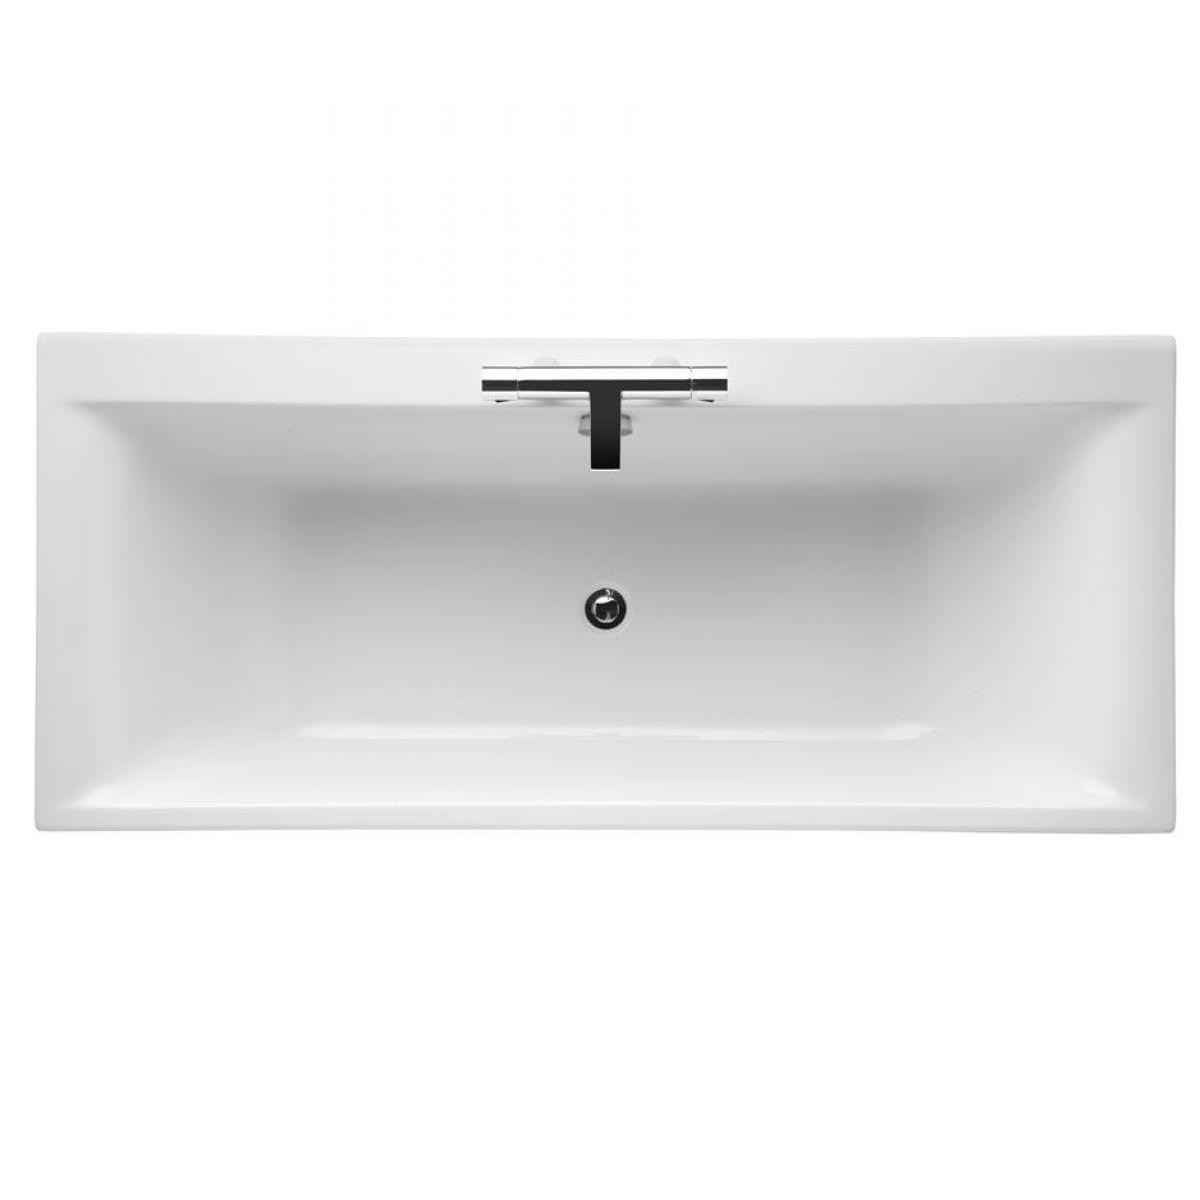 Ideal Standard Concept Idealform Double Ended Bath : UK